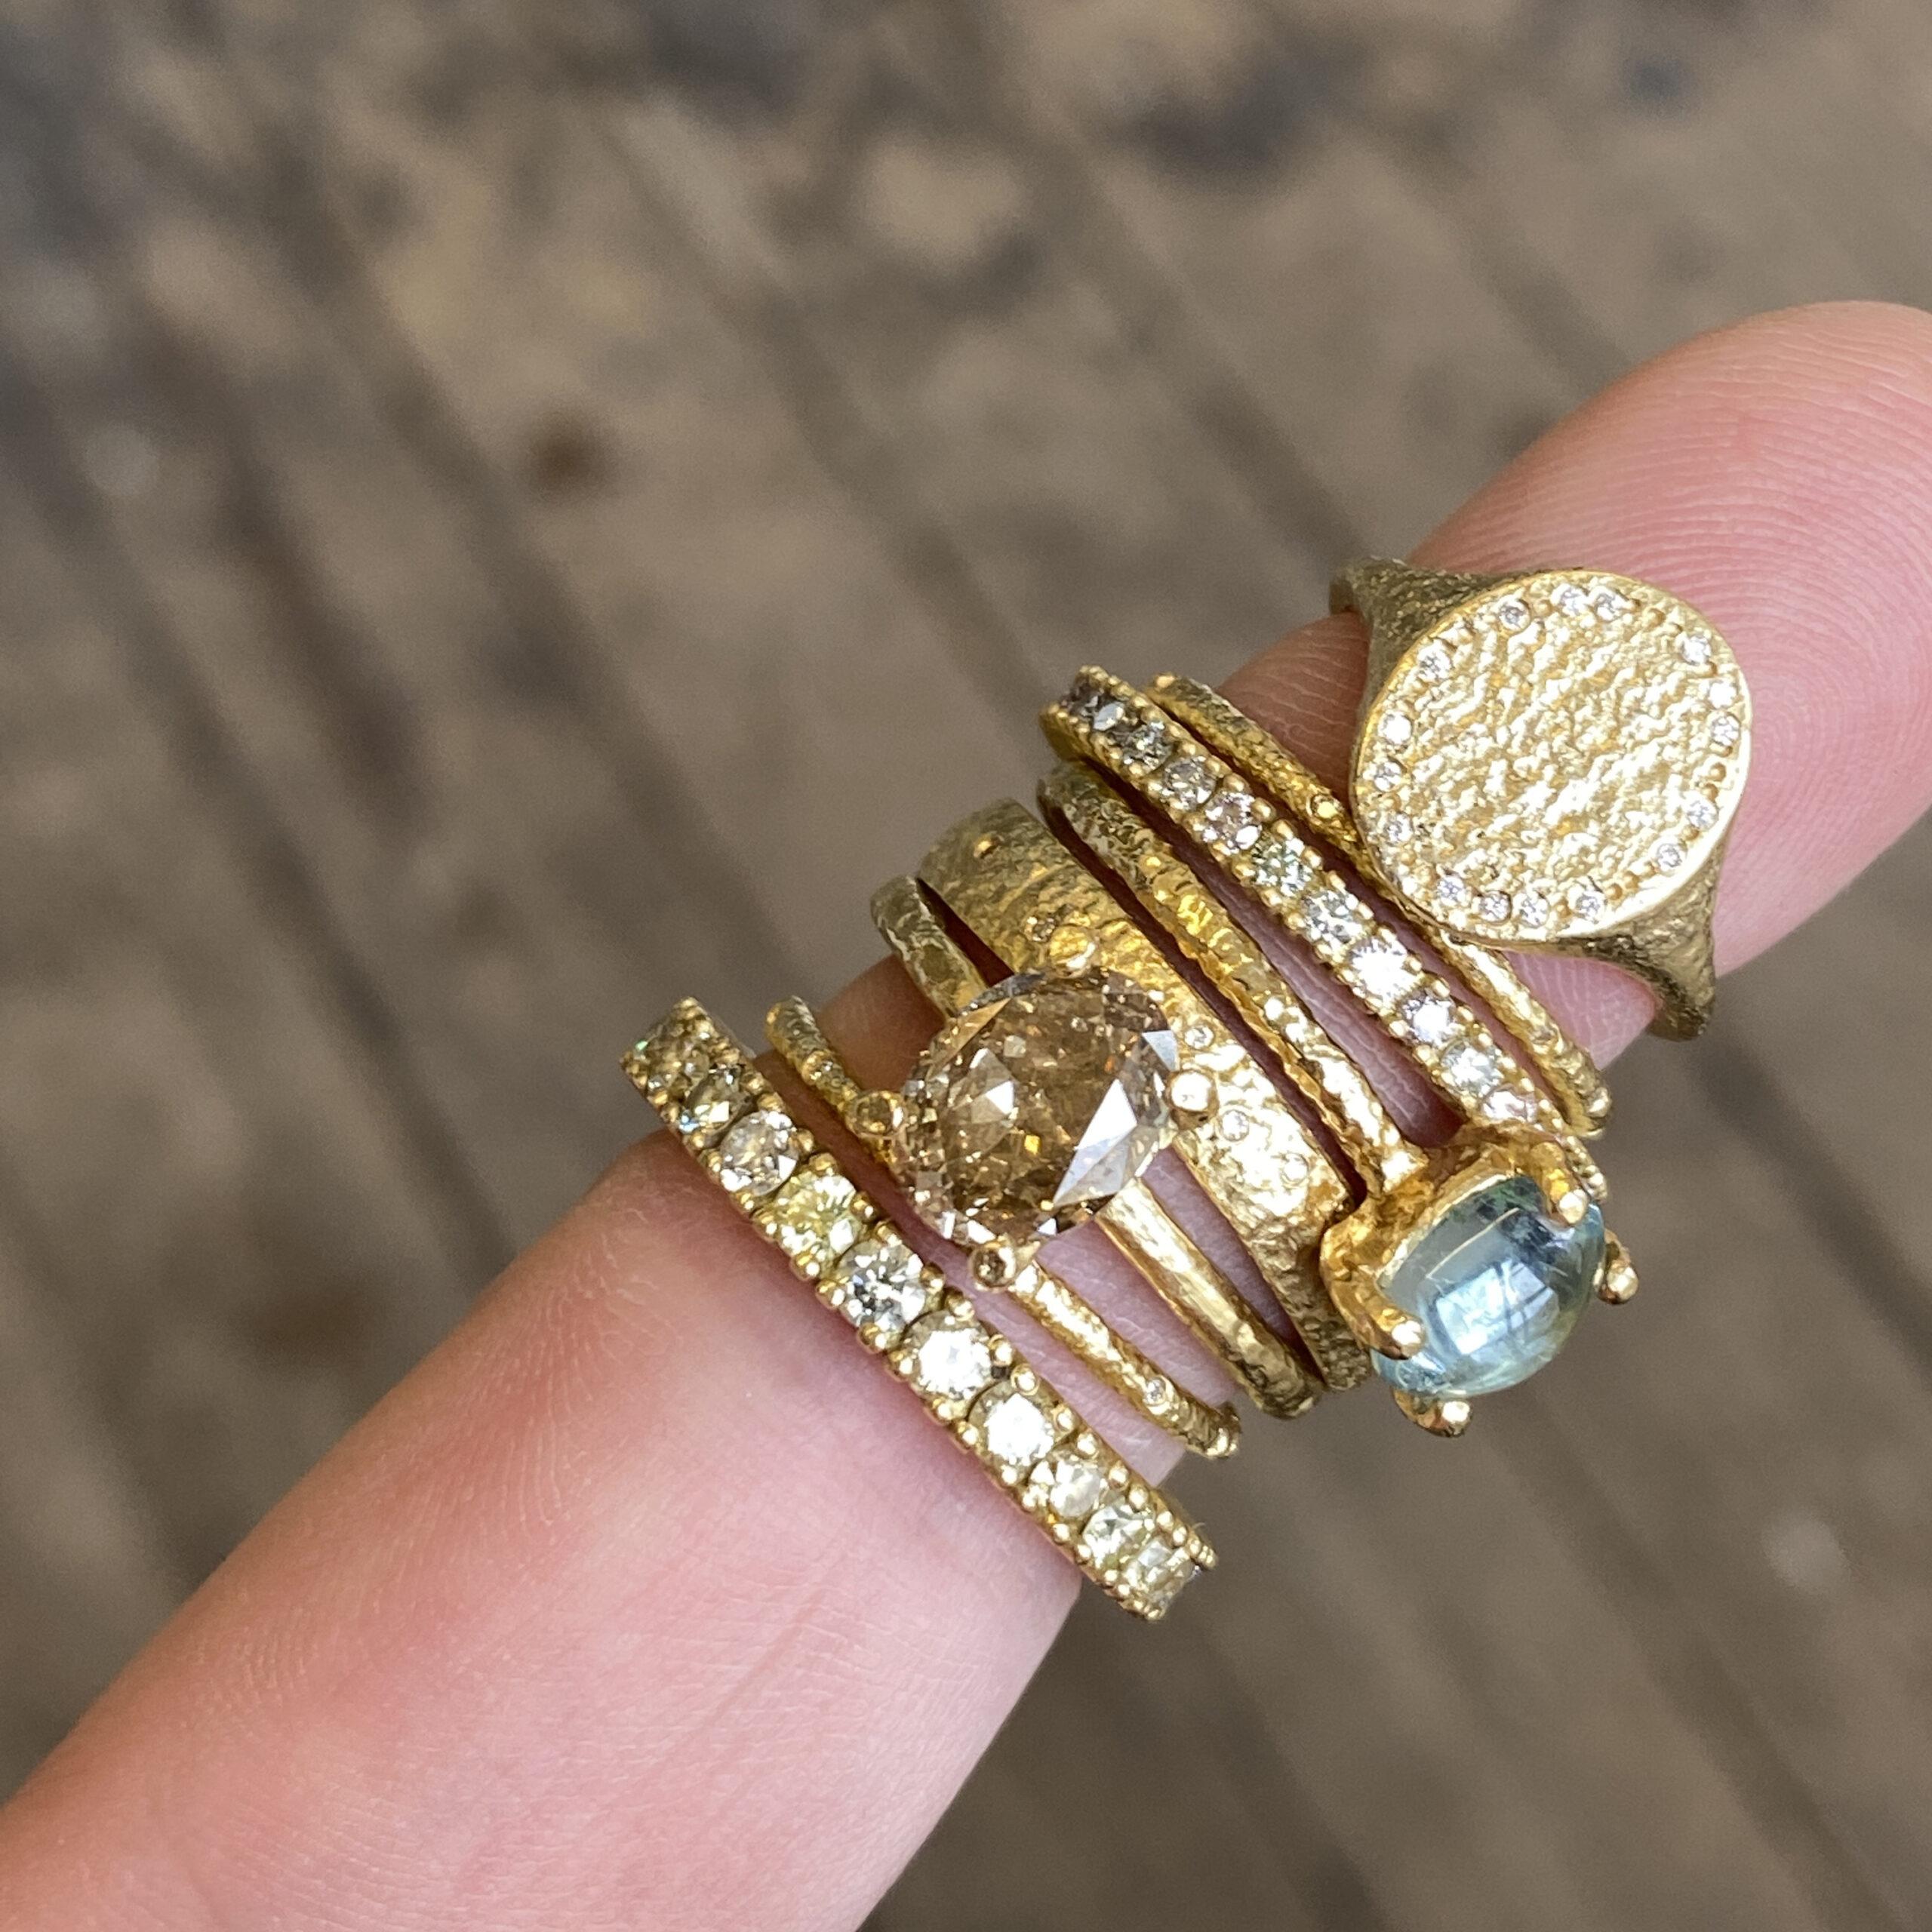 Worn Diamond Eternity Ring 1.75mm